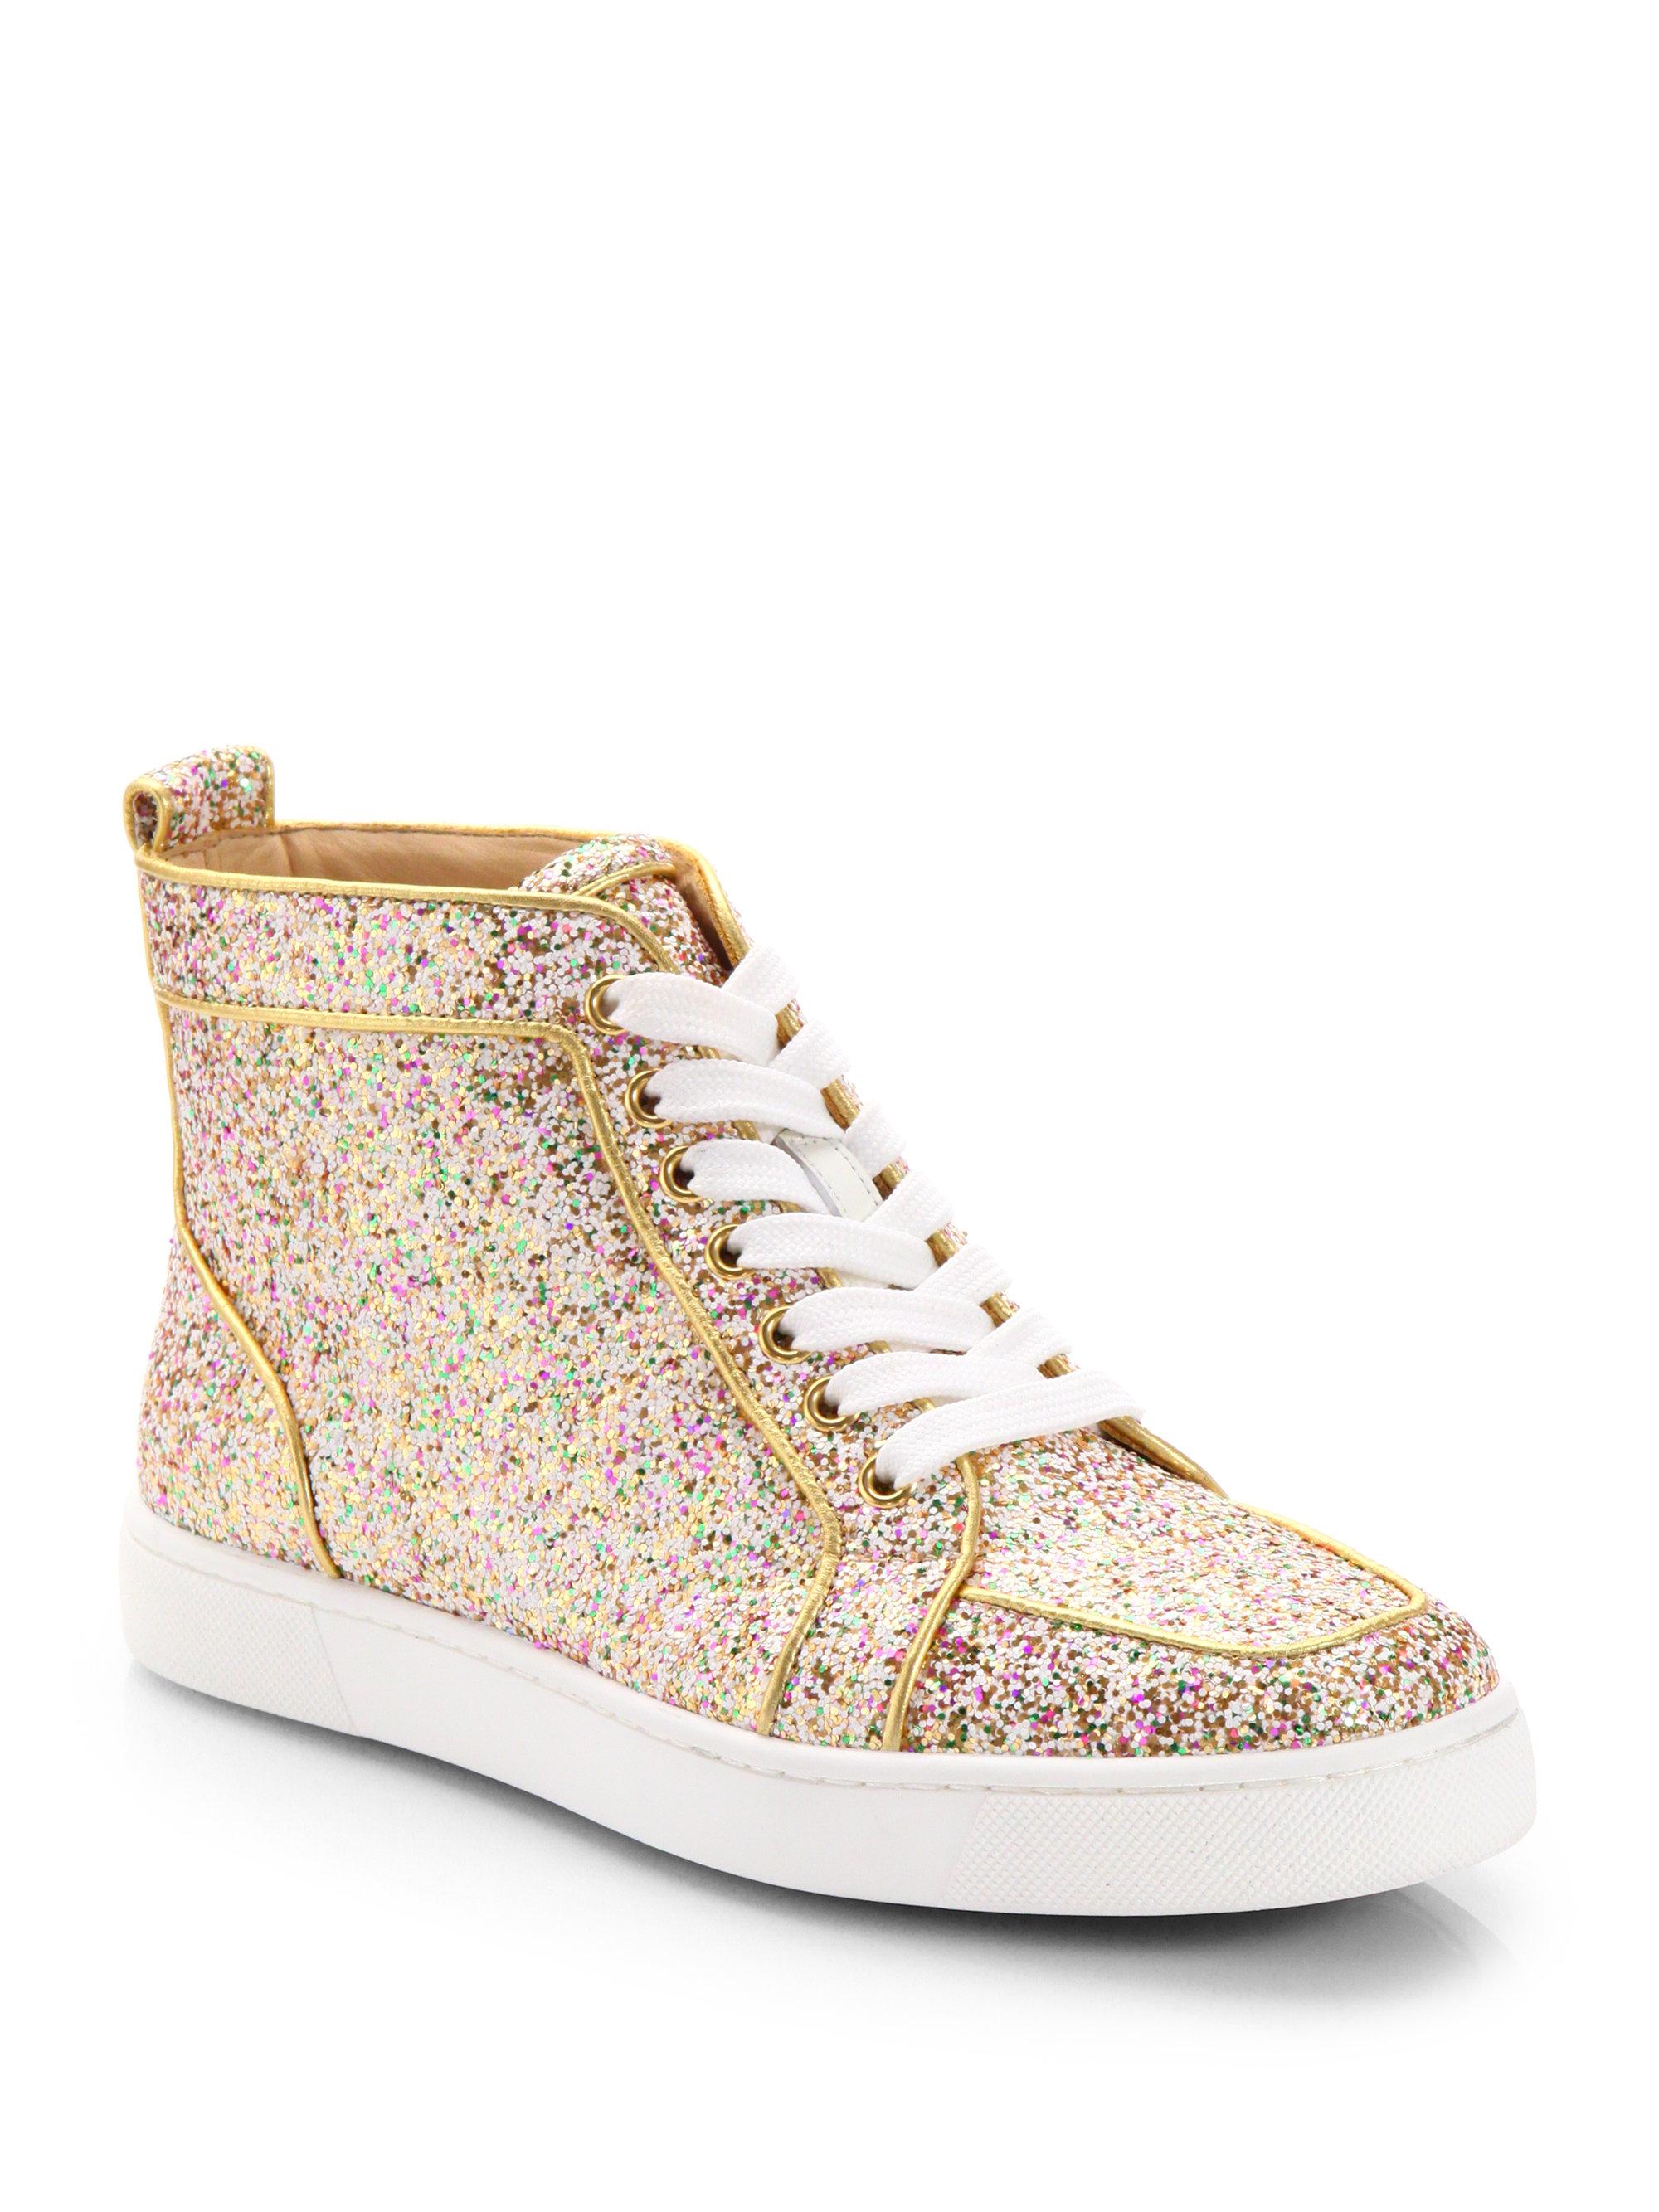 8244a3880e2 ... wholesale christian louboutin glitter hightop sneakers in metallic lyst  c3930 834ee